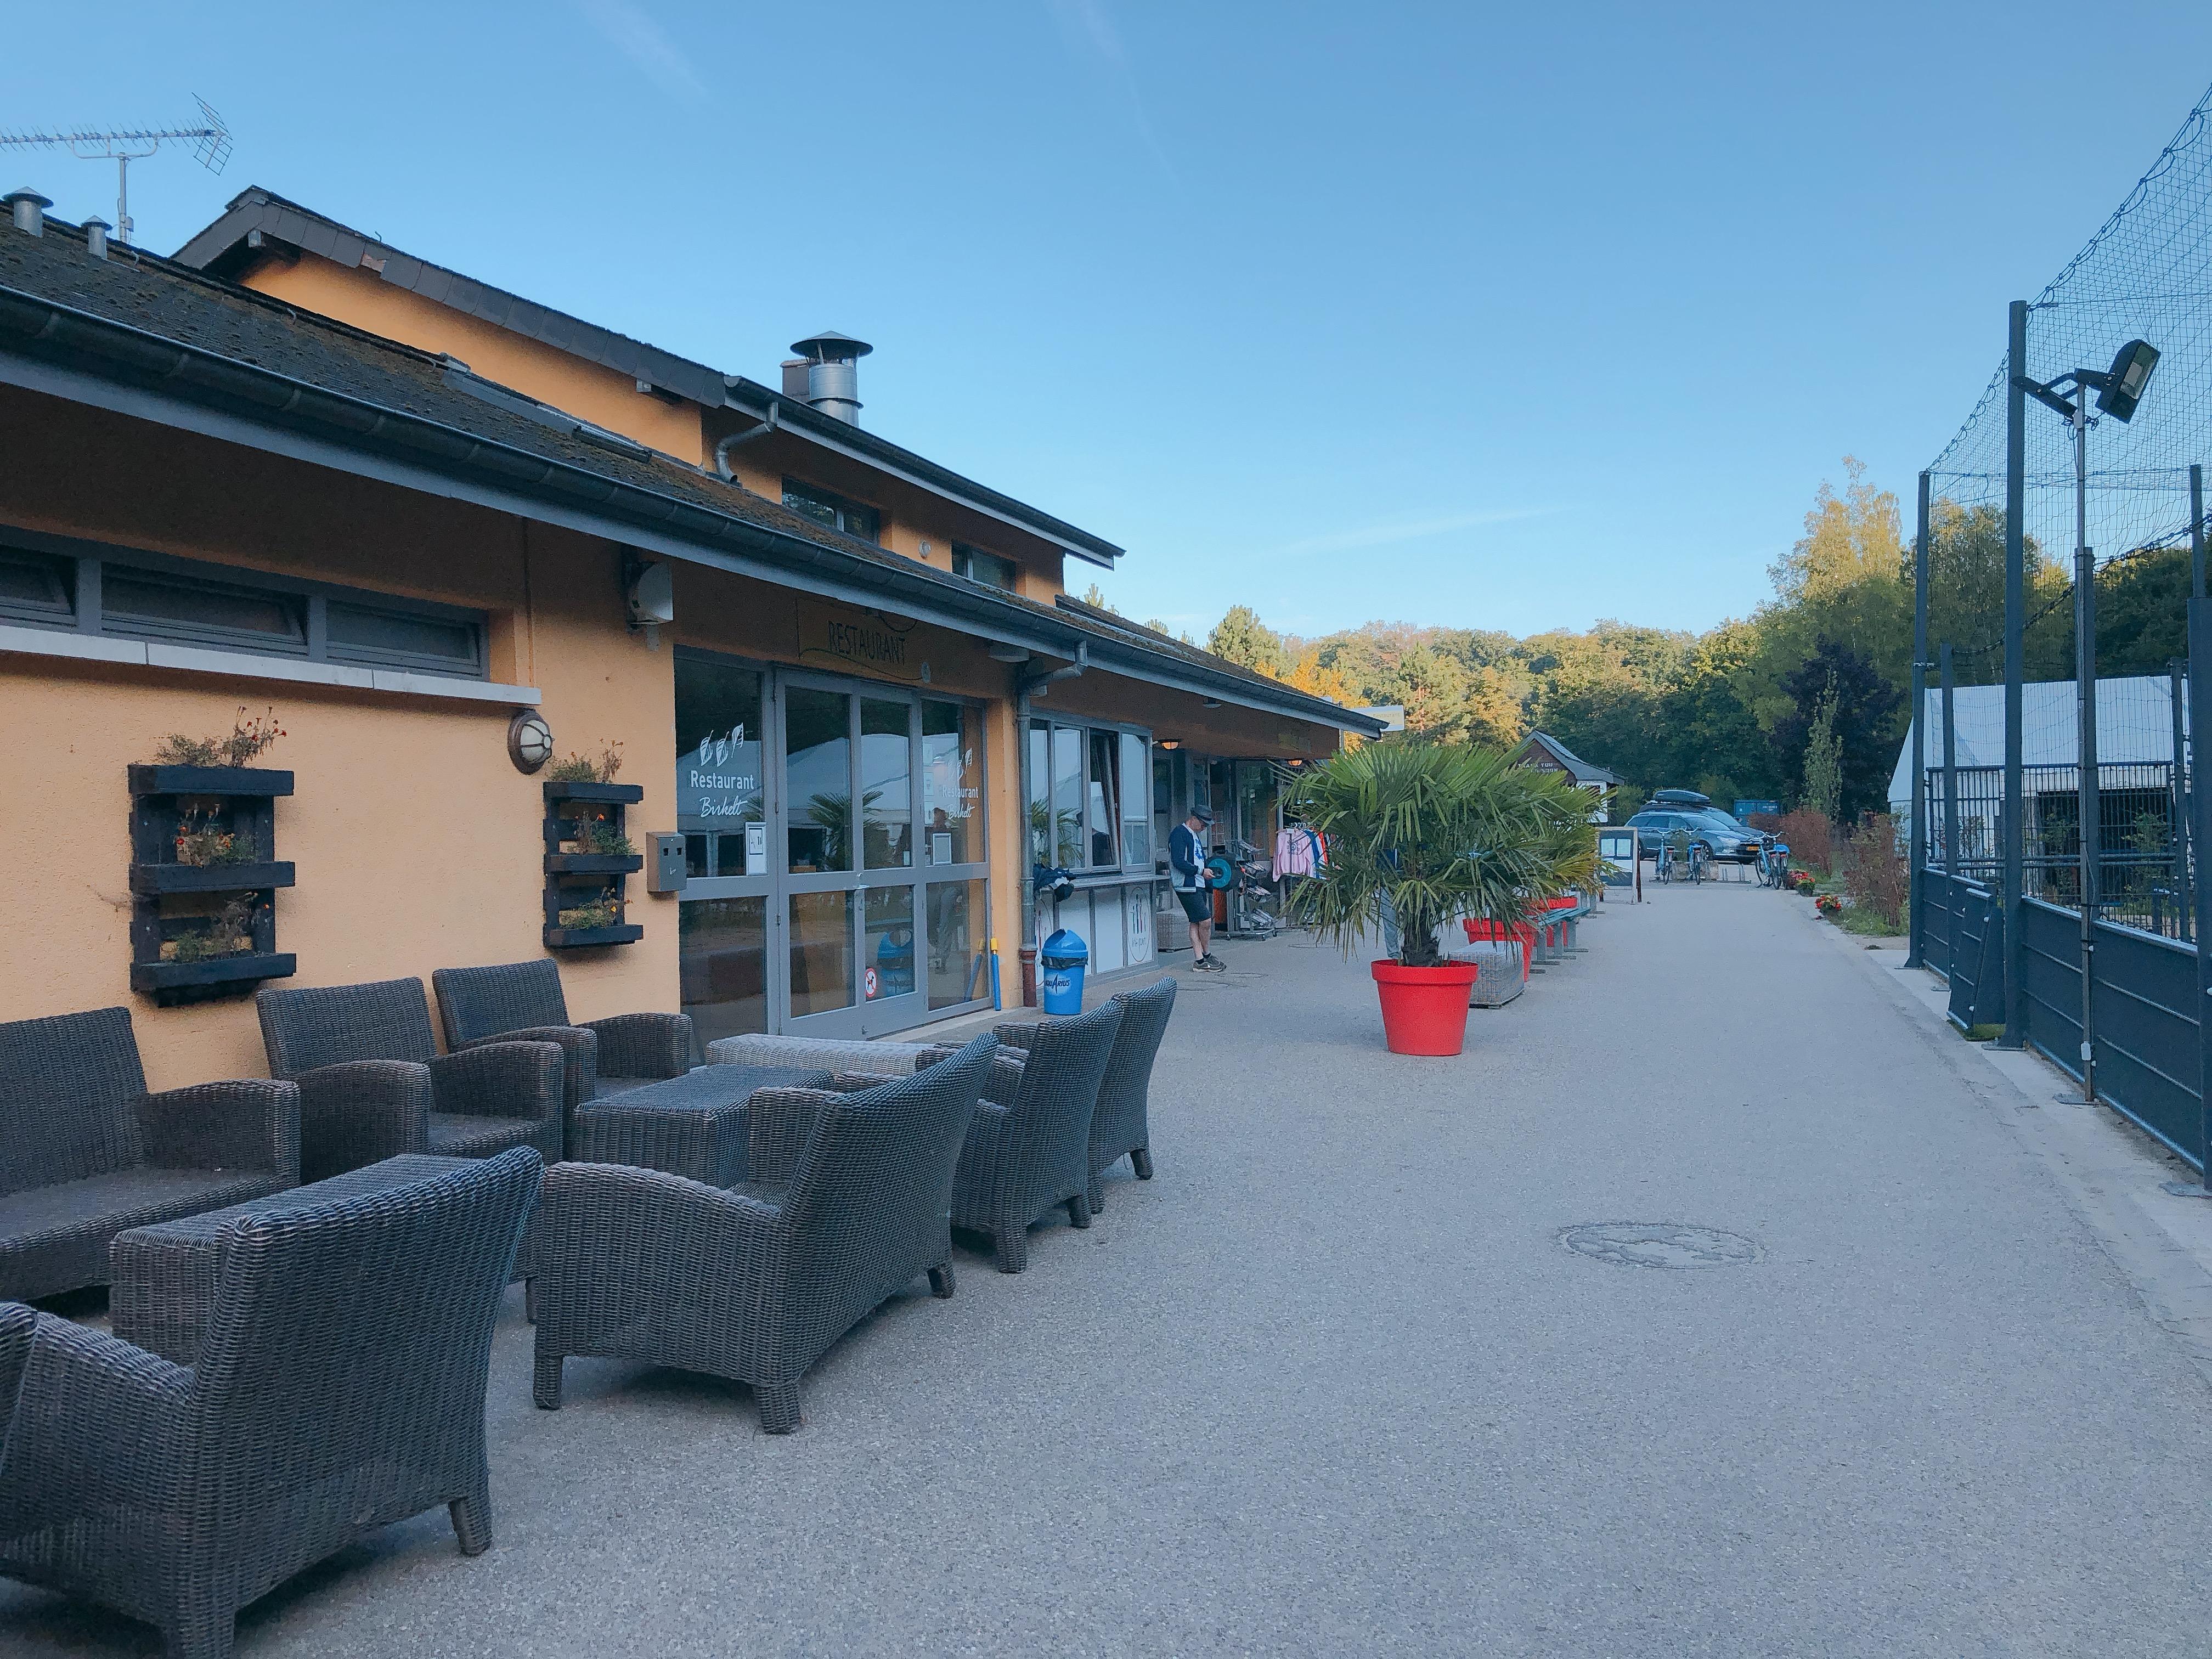 IMG 2013 - Fotodagboek Vakantie: Camping Iris Parc Birkelt in Luxemburg!